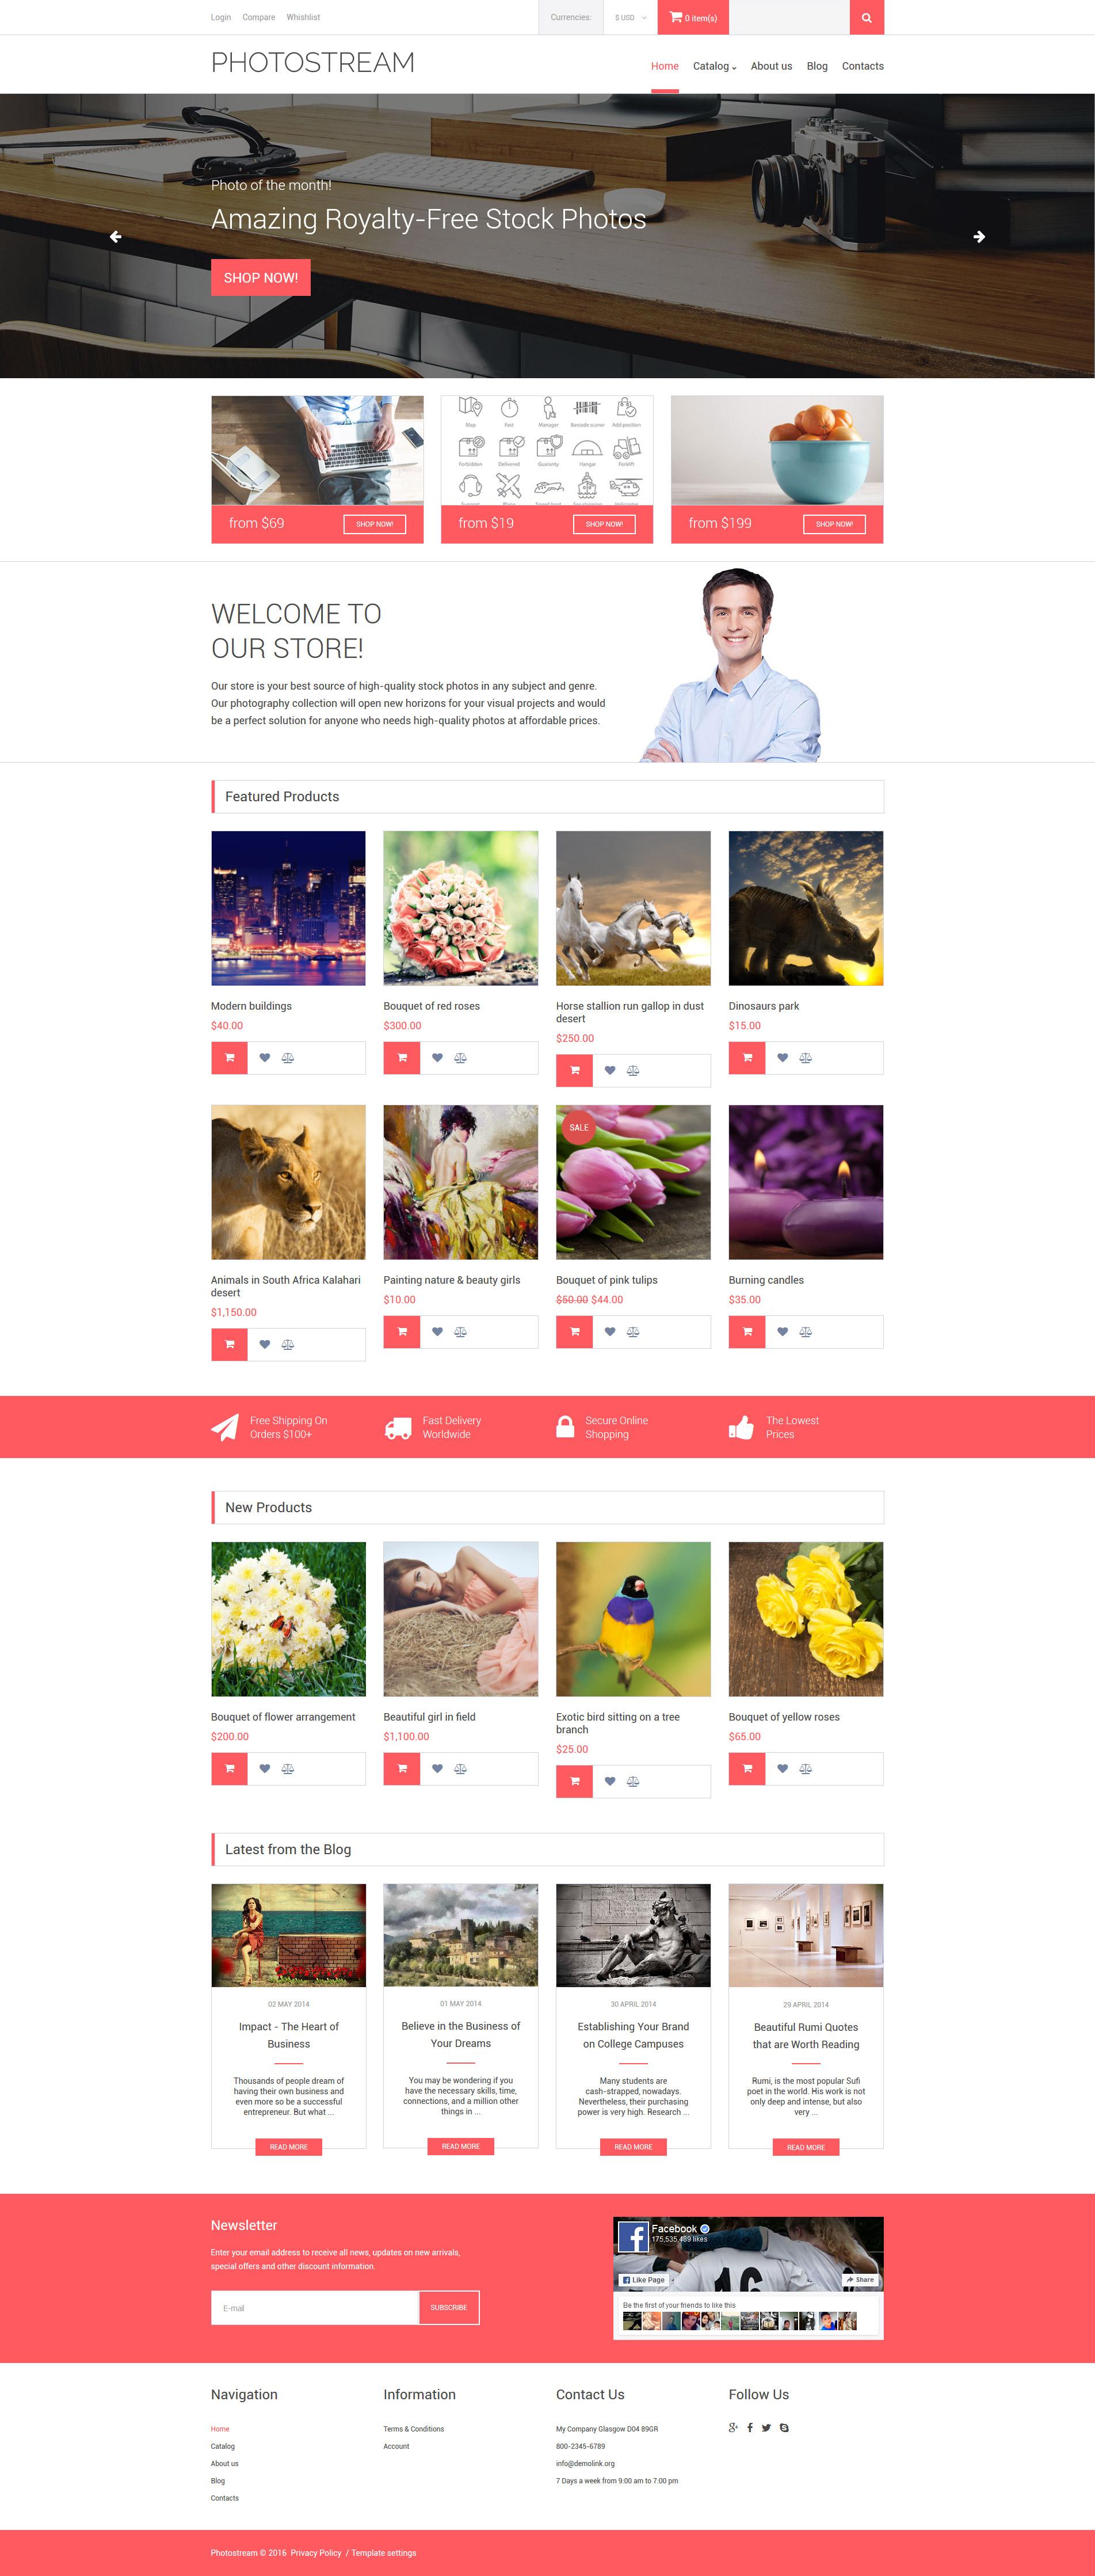 Szablon VirtueMart #61399 na temat: zdjęcia stokowe - zrzut ekranu